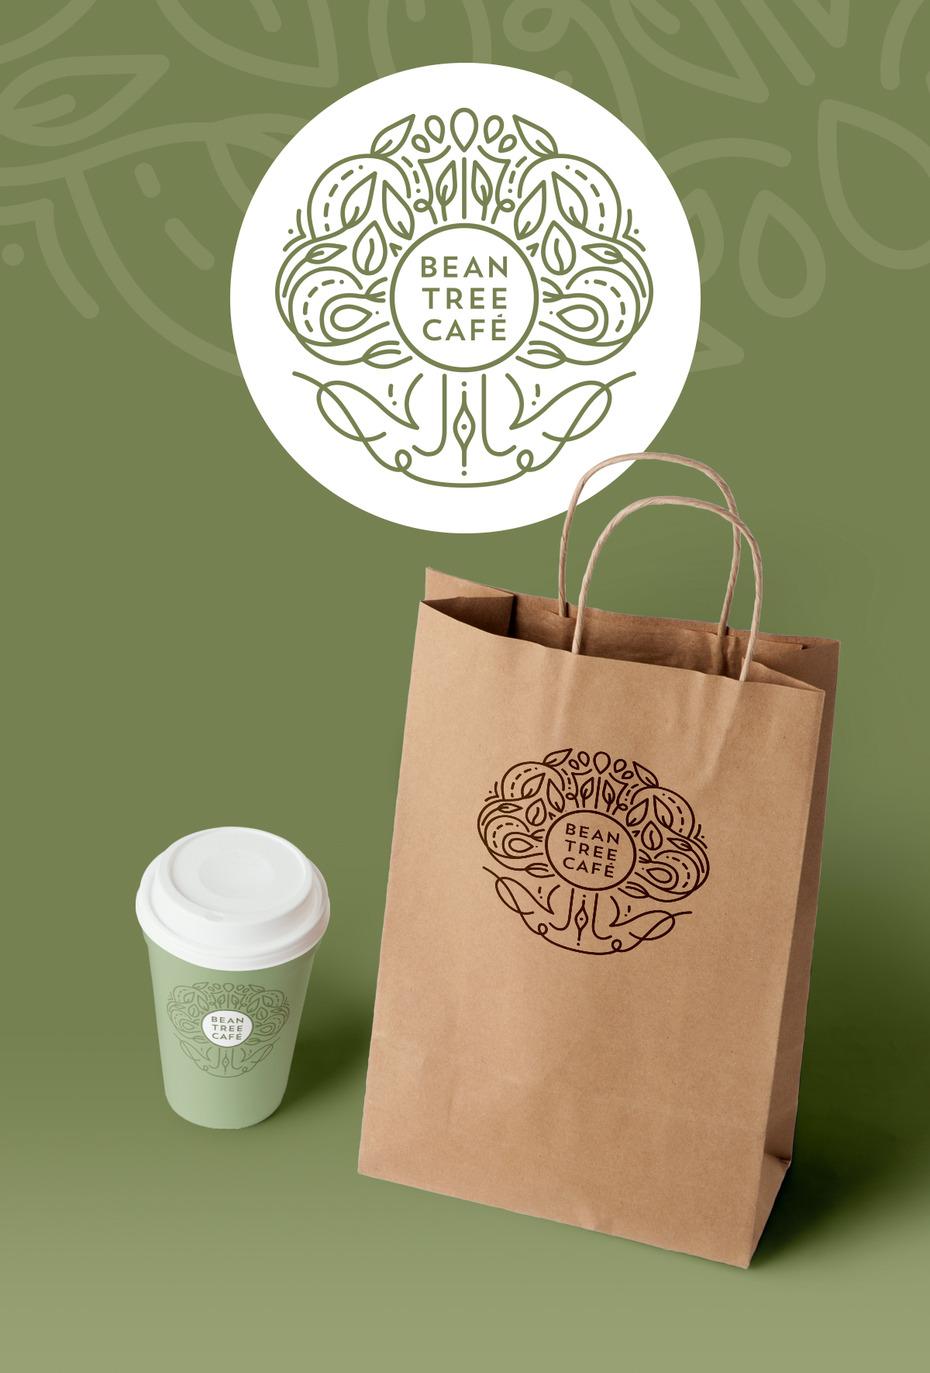 Beantree brand